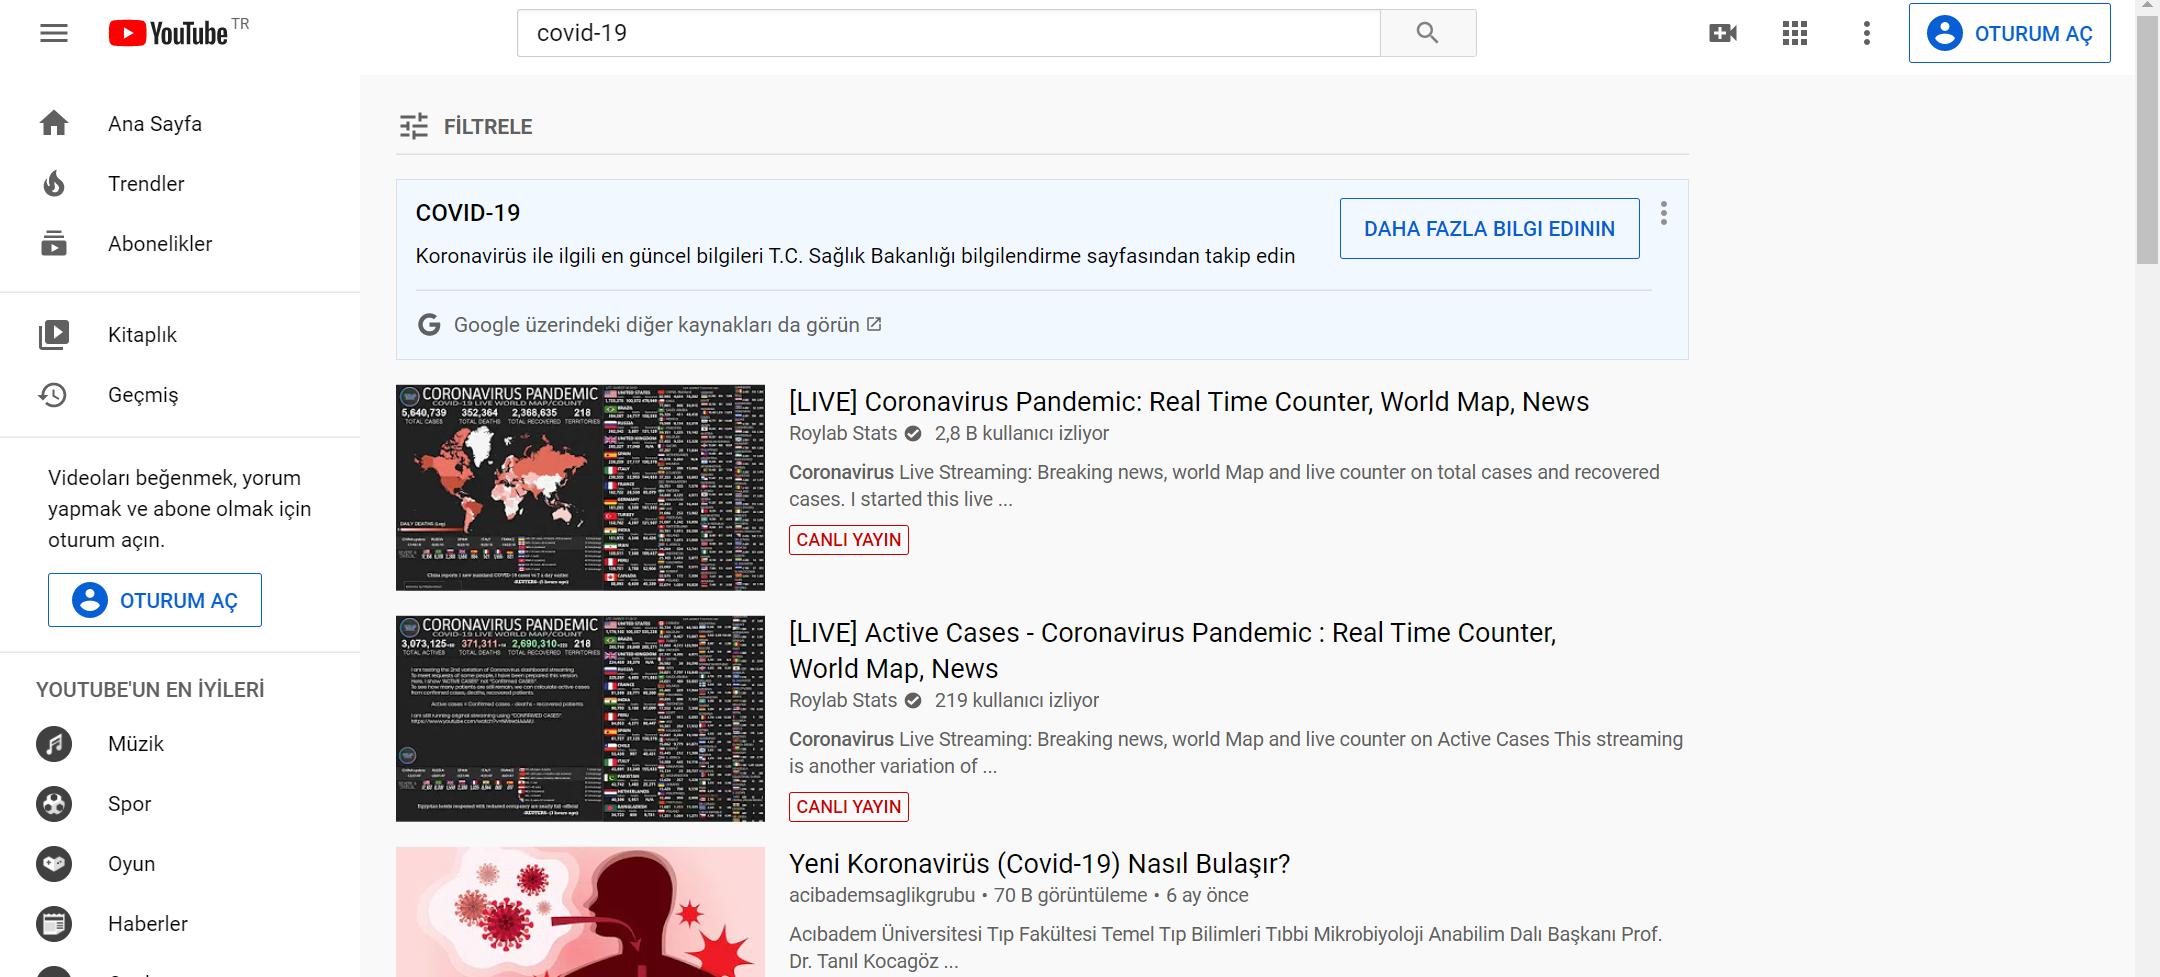 youtube koronavirüs, youtube